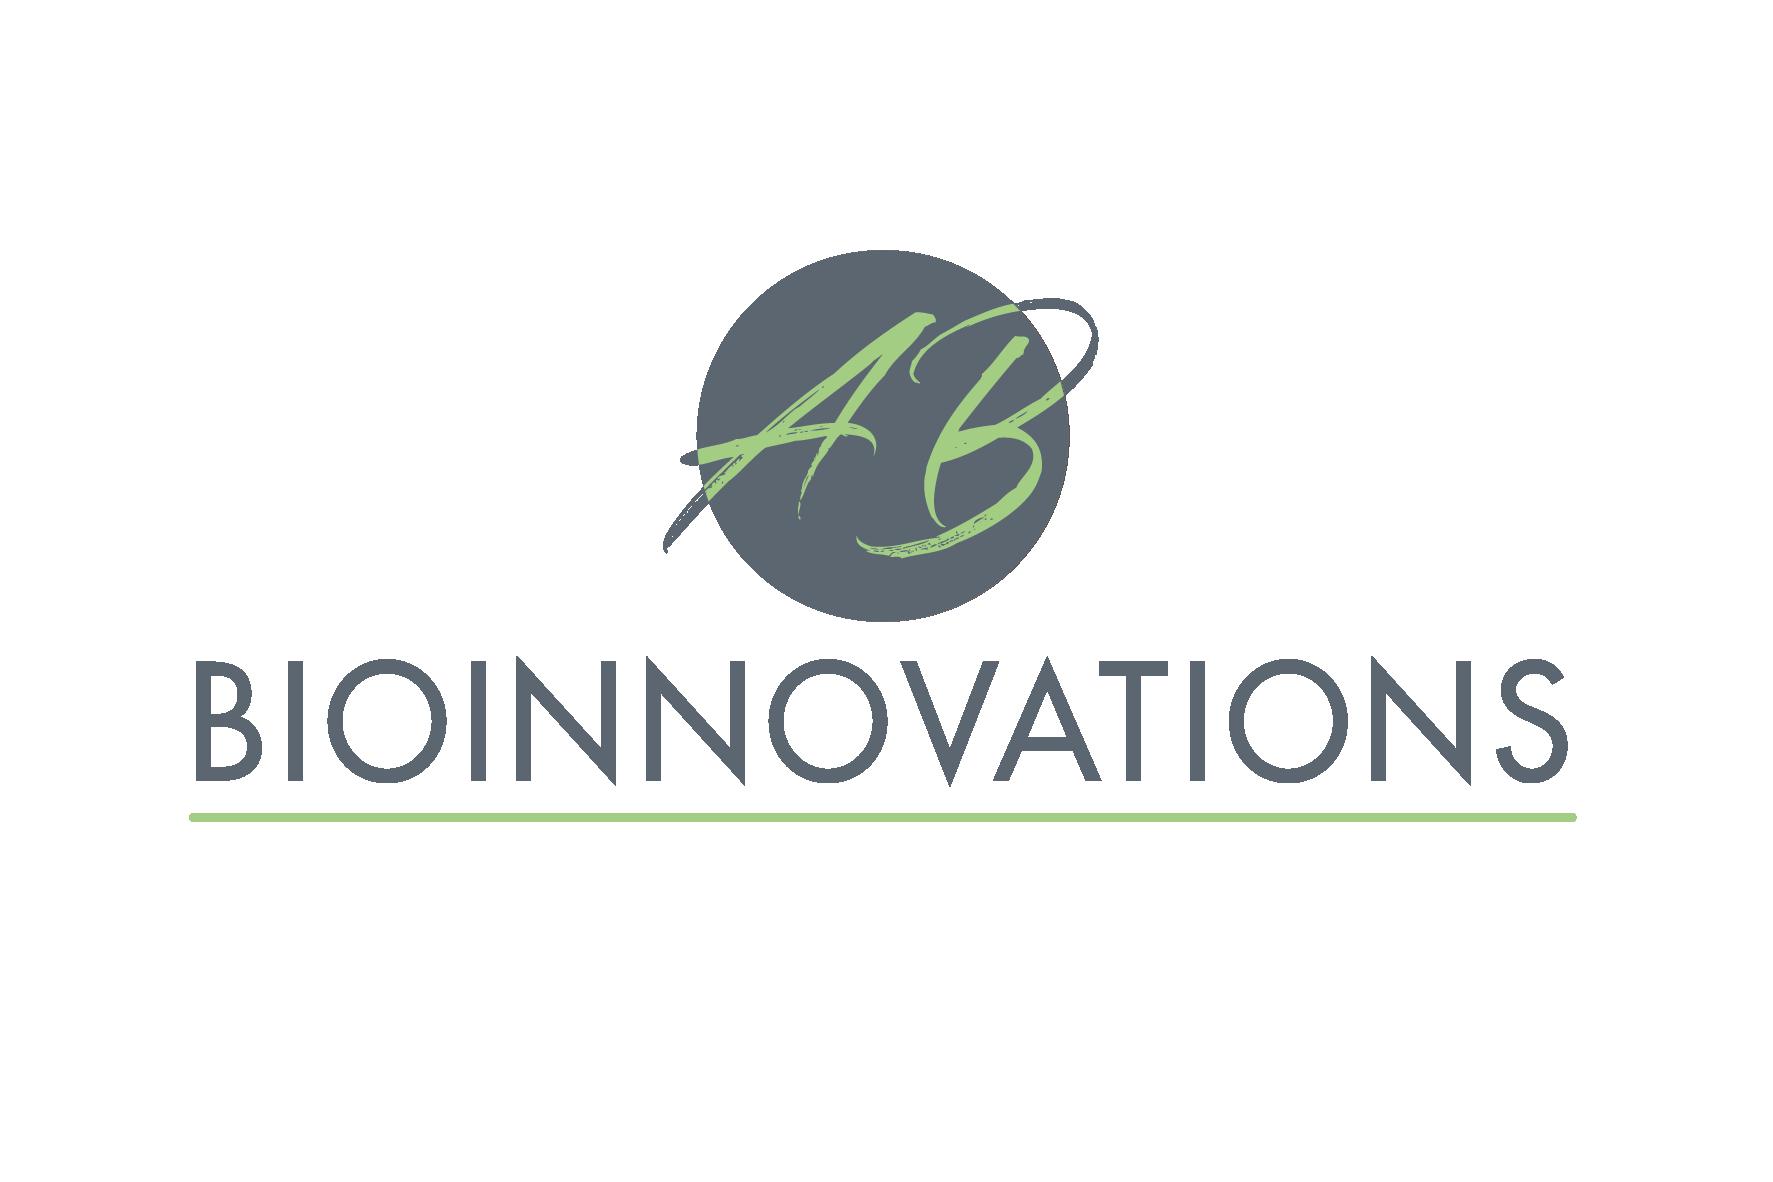 AB BIOINNOVATIONS, Inc. Announces a Ground-Breaking Alternative to Antibiotics